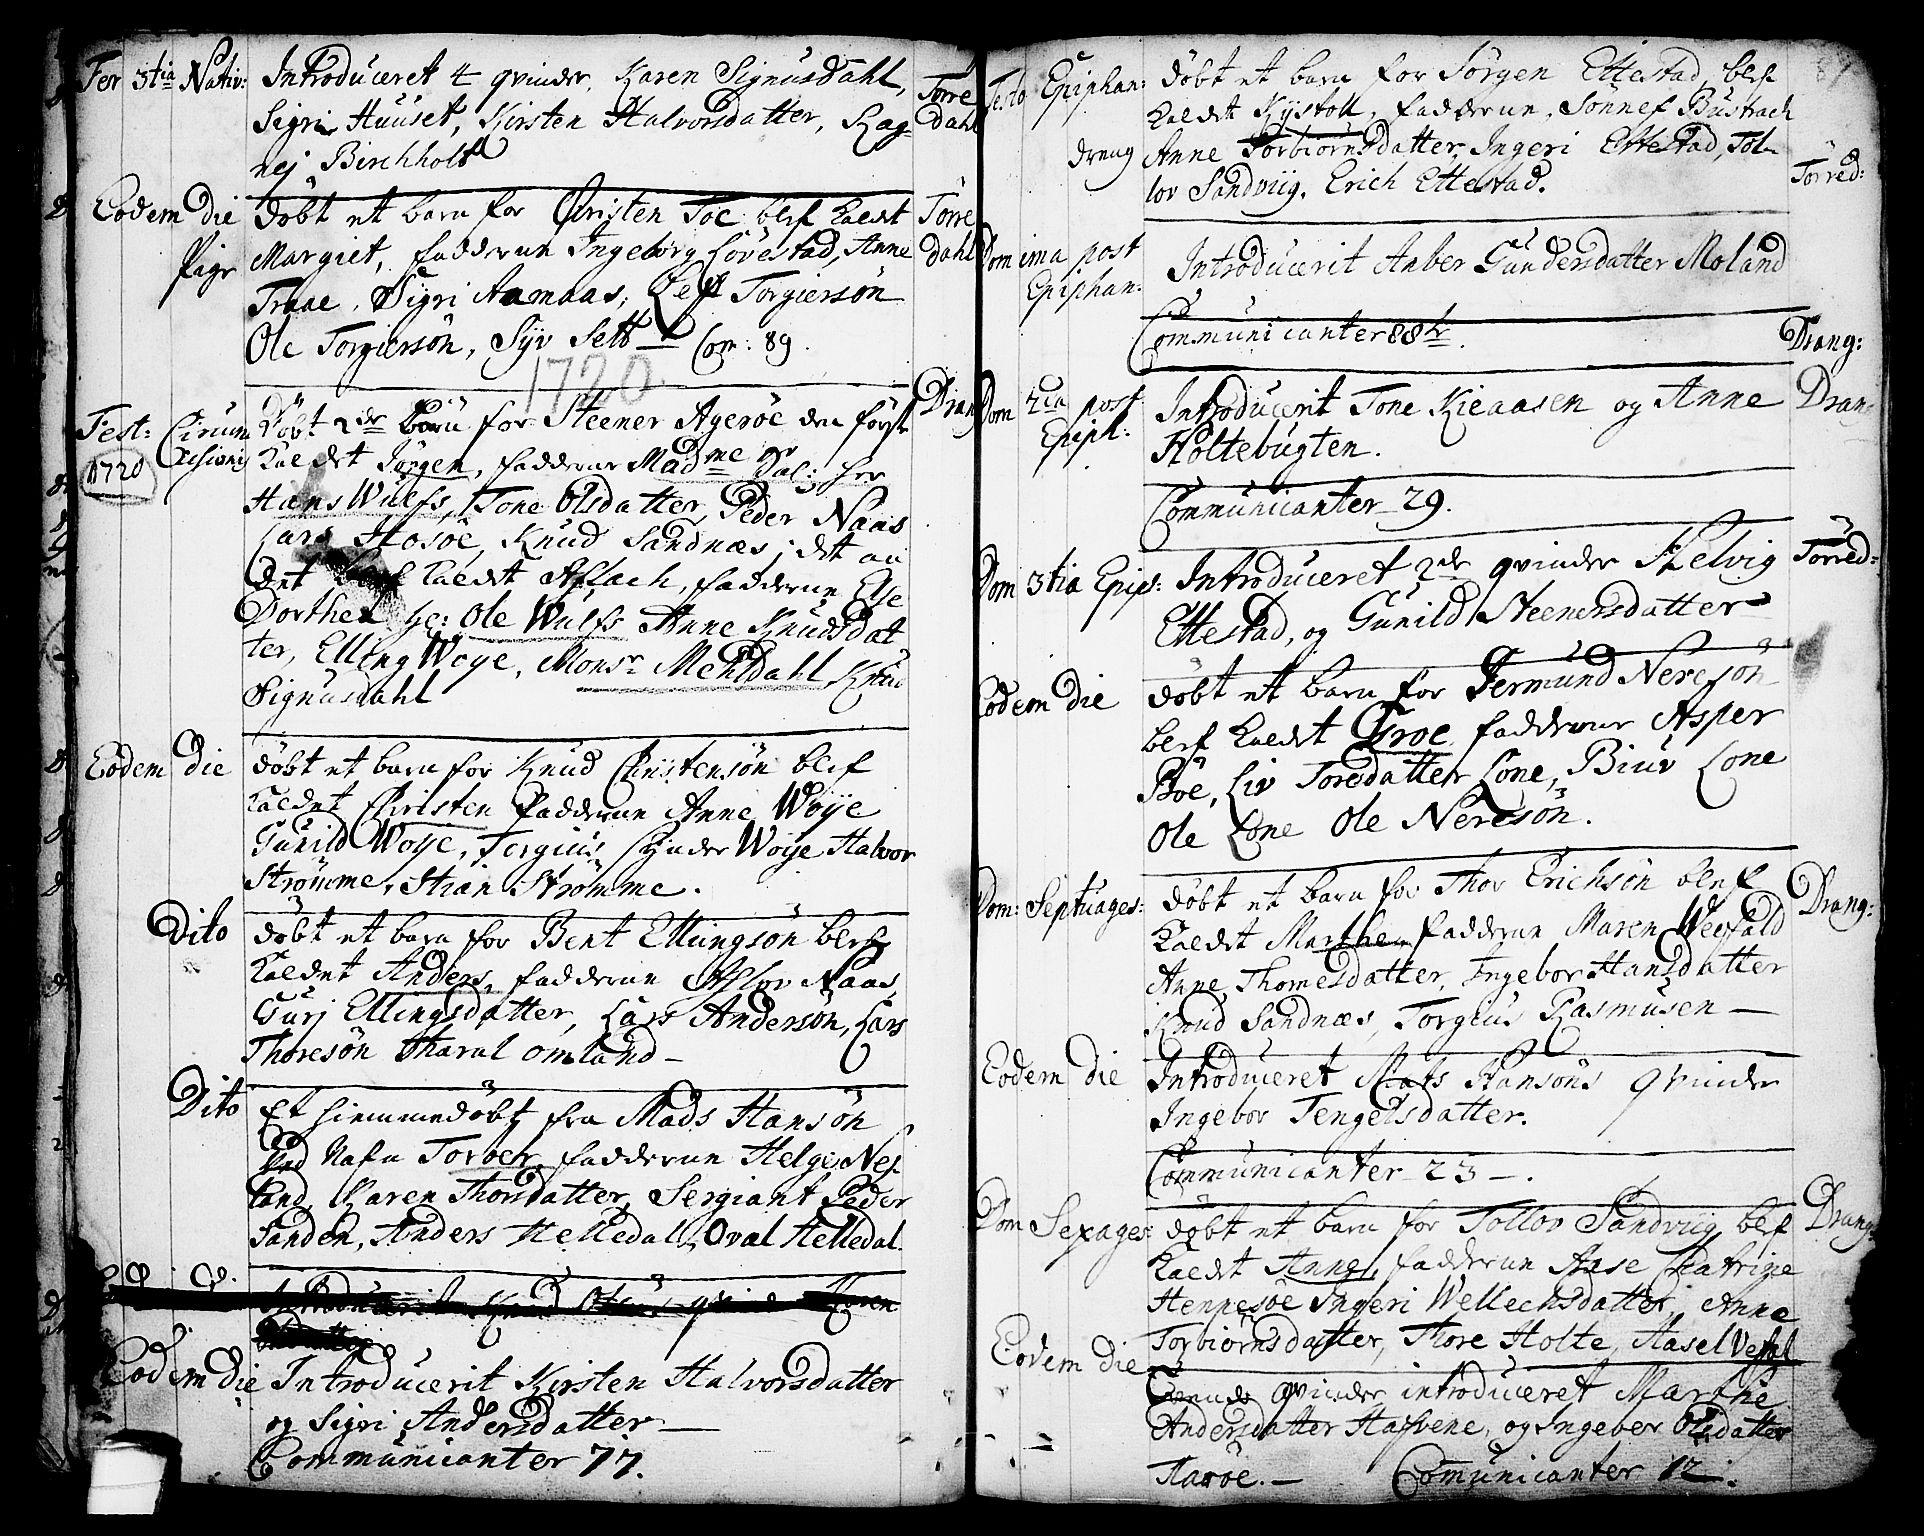 SAKO, Drangedal kirkebøker, F/Fa/L0001: Ministerialbok nr. 1, 1697-1767, s. 87